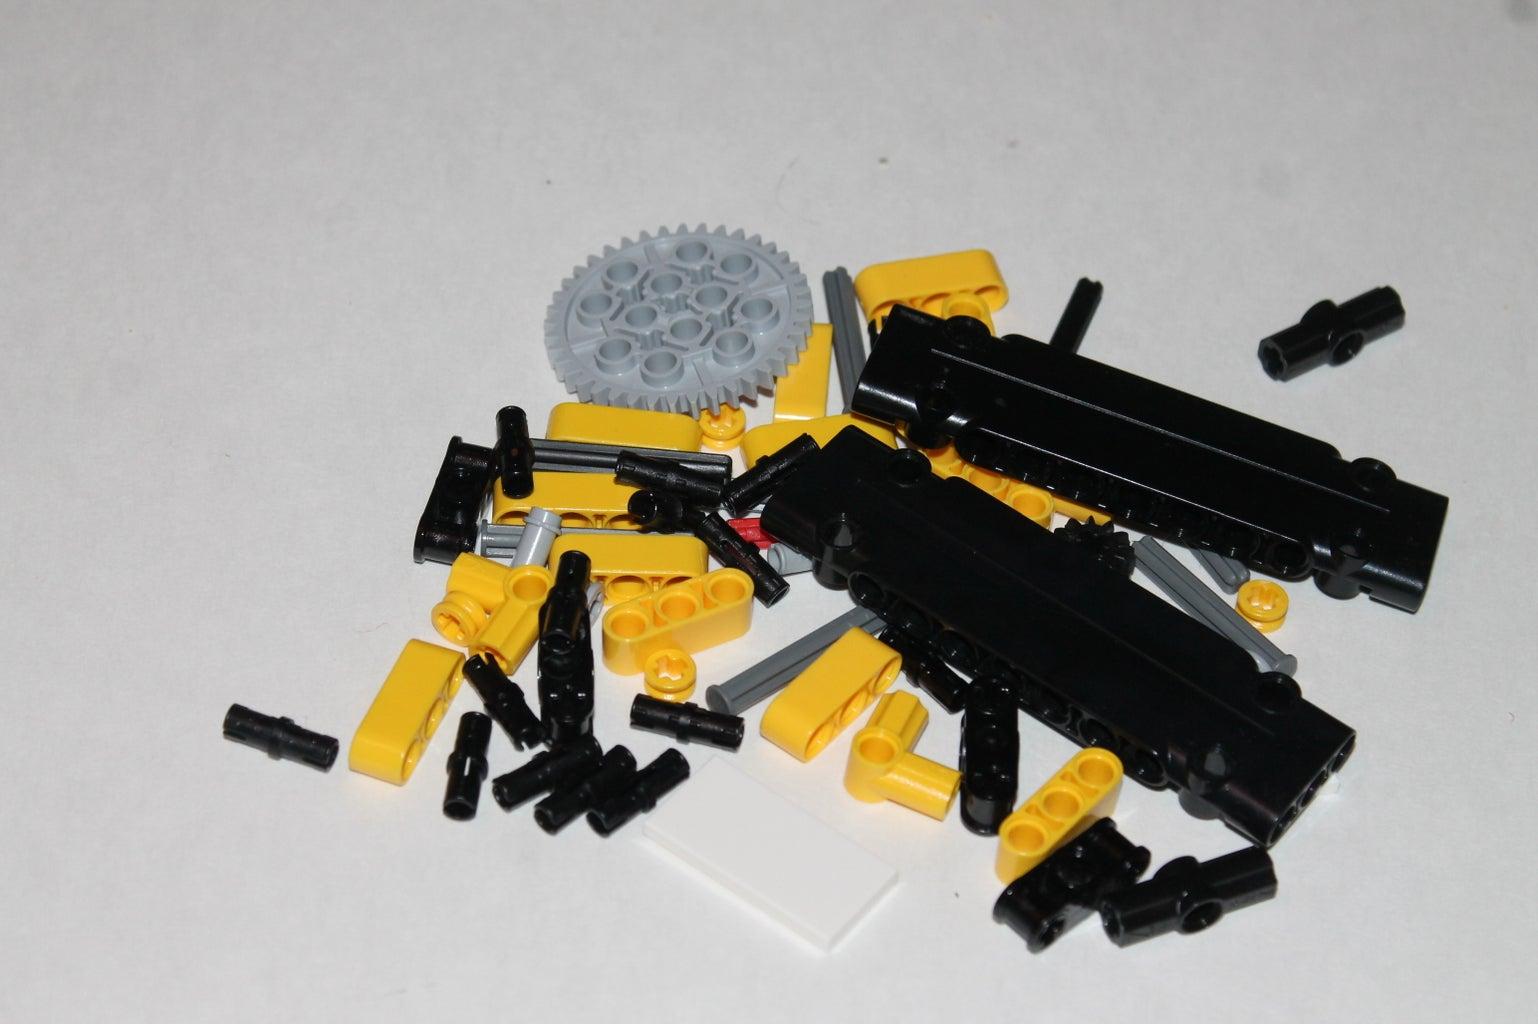 Gratuitous Photos of Piles of Brand New Legos